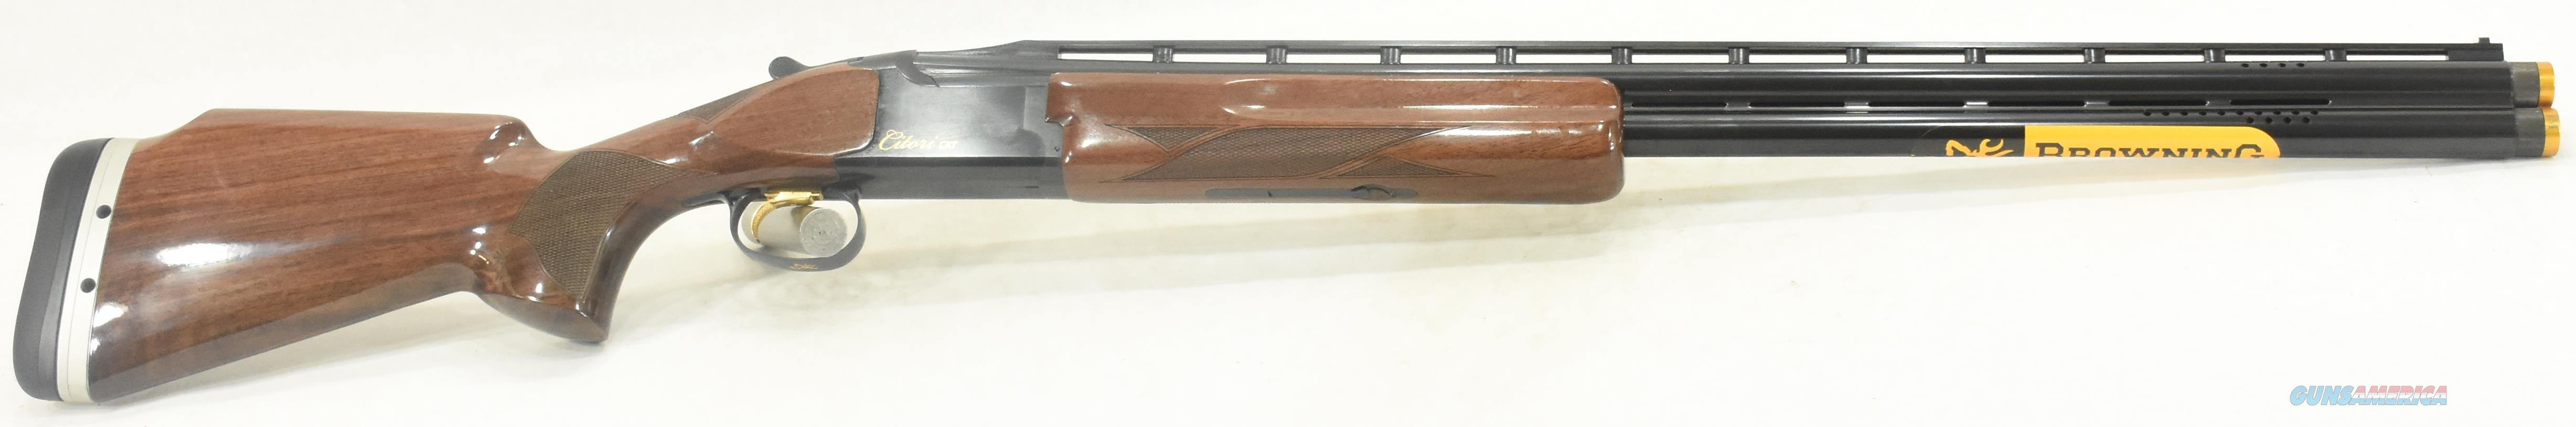 Citori CXT Micro LOP 12Ga 28-3In 018164328  Guns > Shotguns > Browning Shotguns > Over Unders > Citori > Hunting